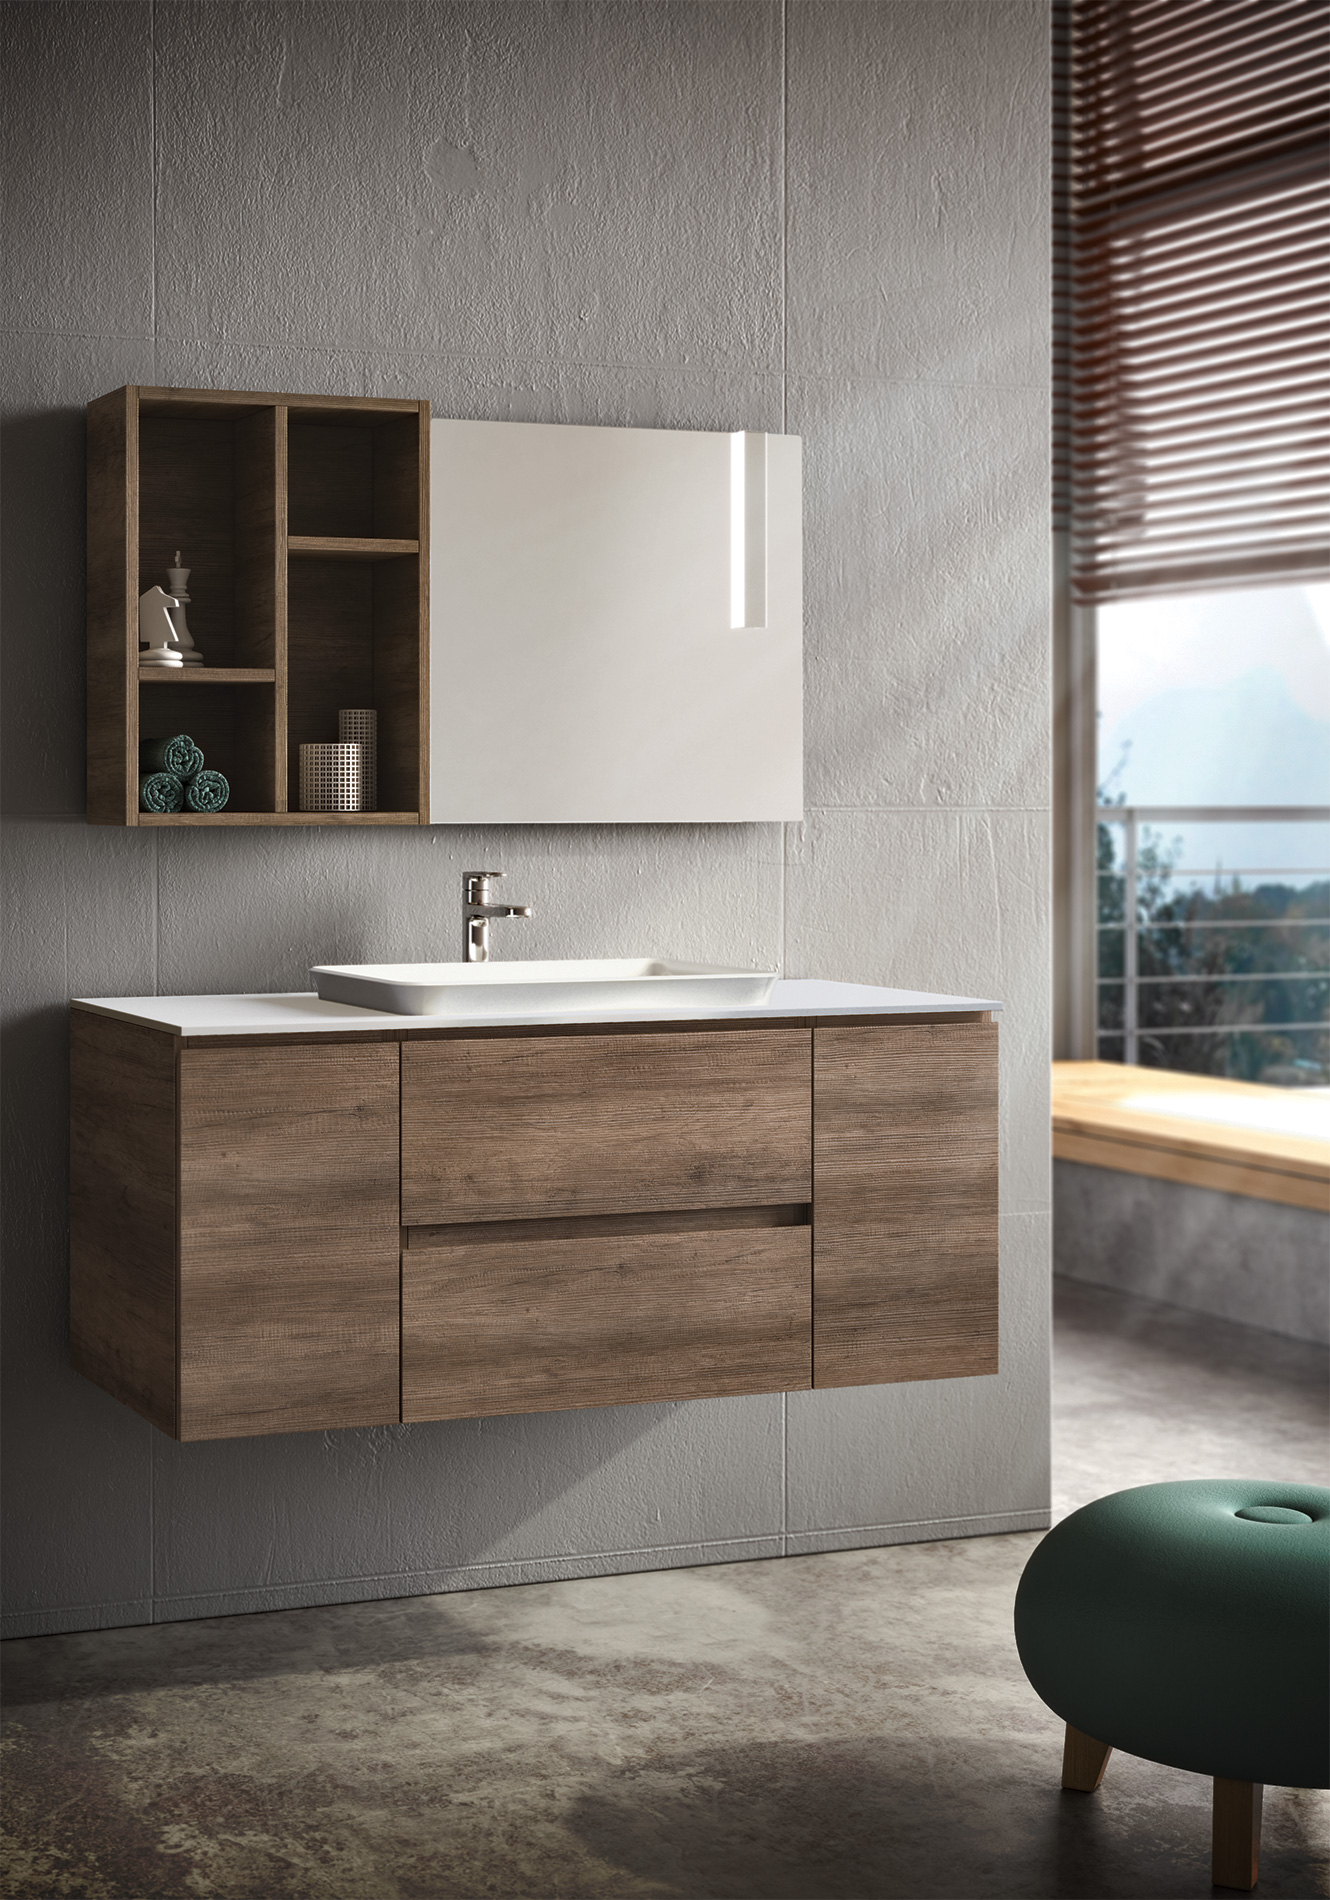 Bathroom Happy 07 - Licor Design